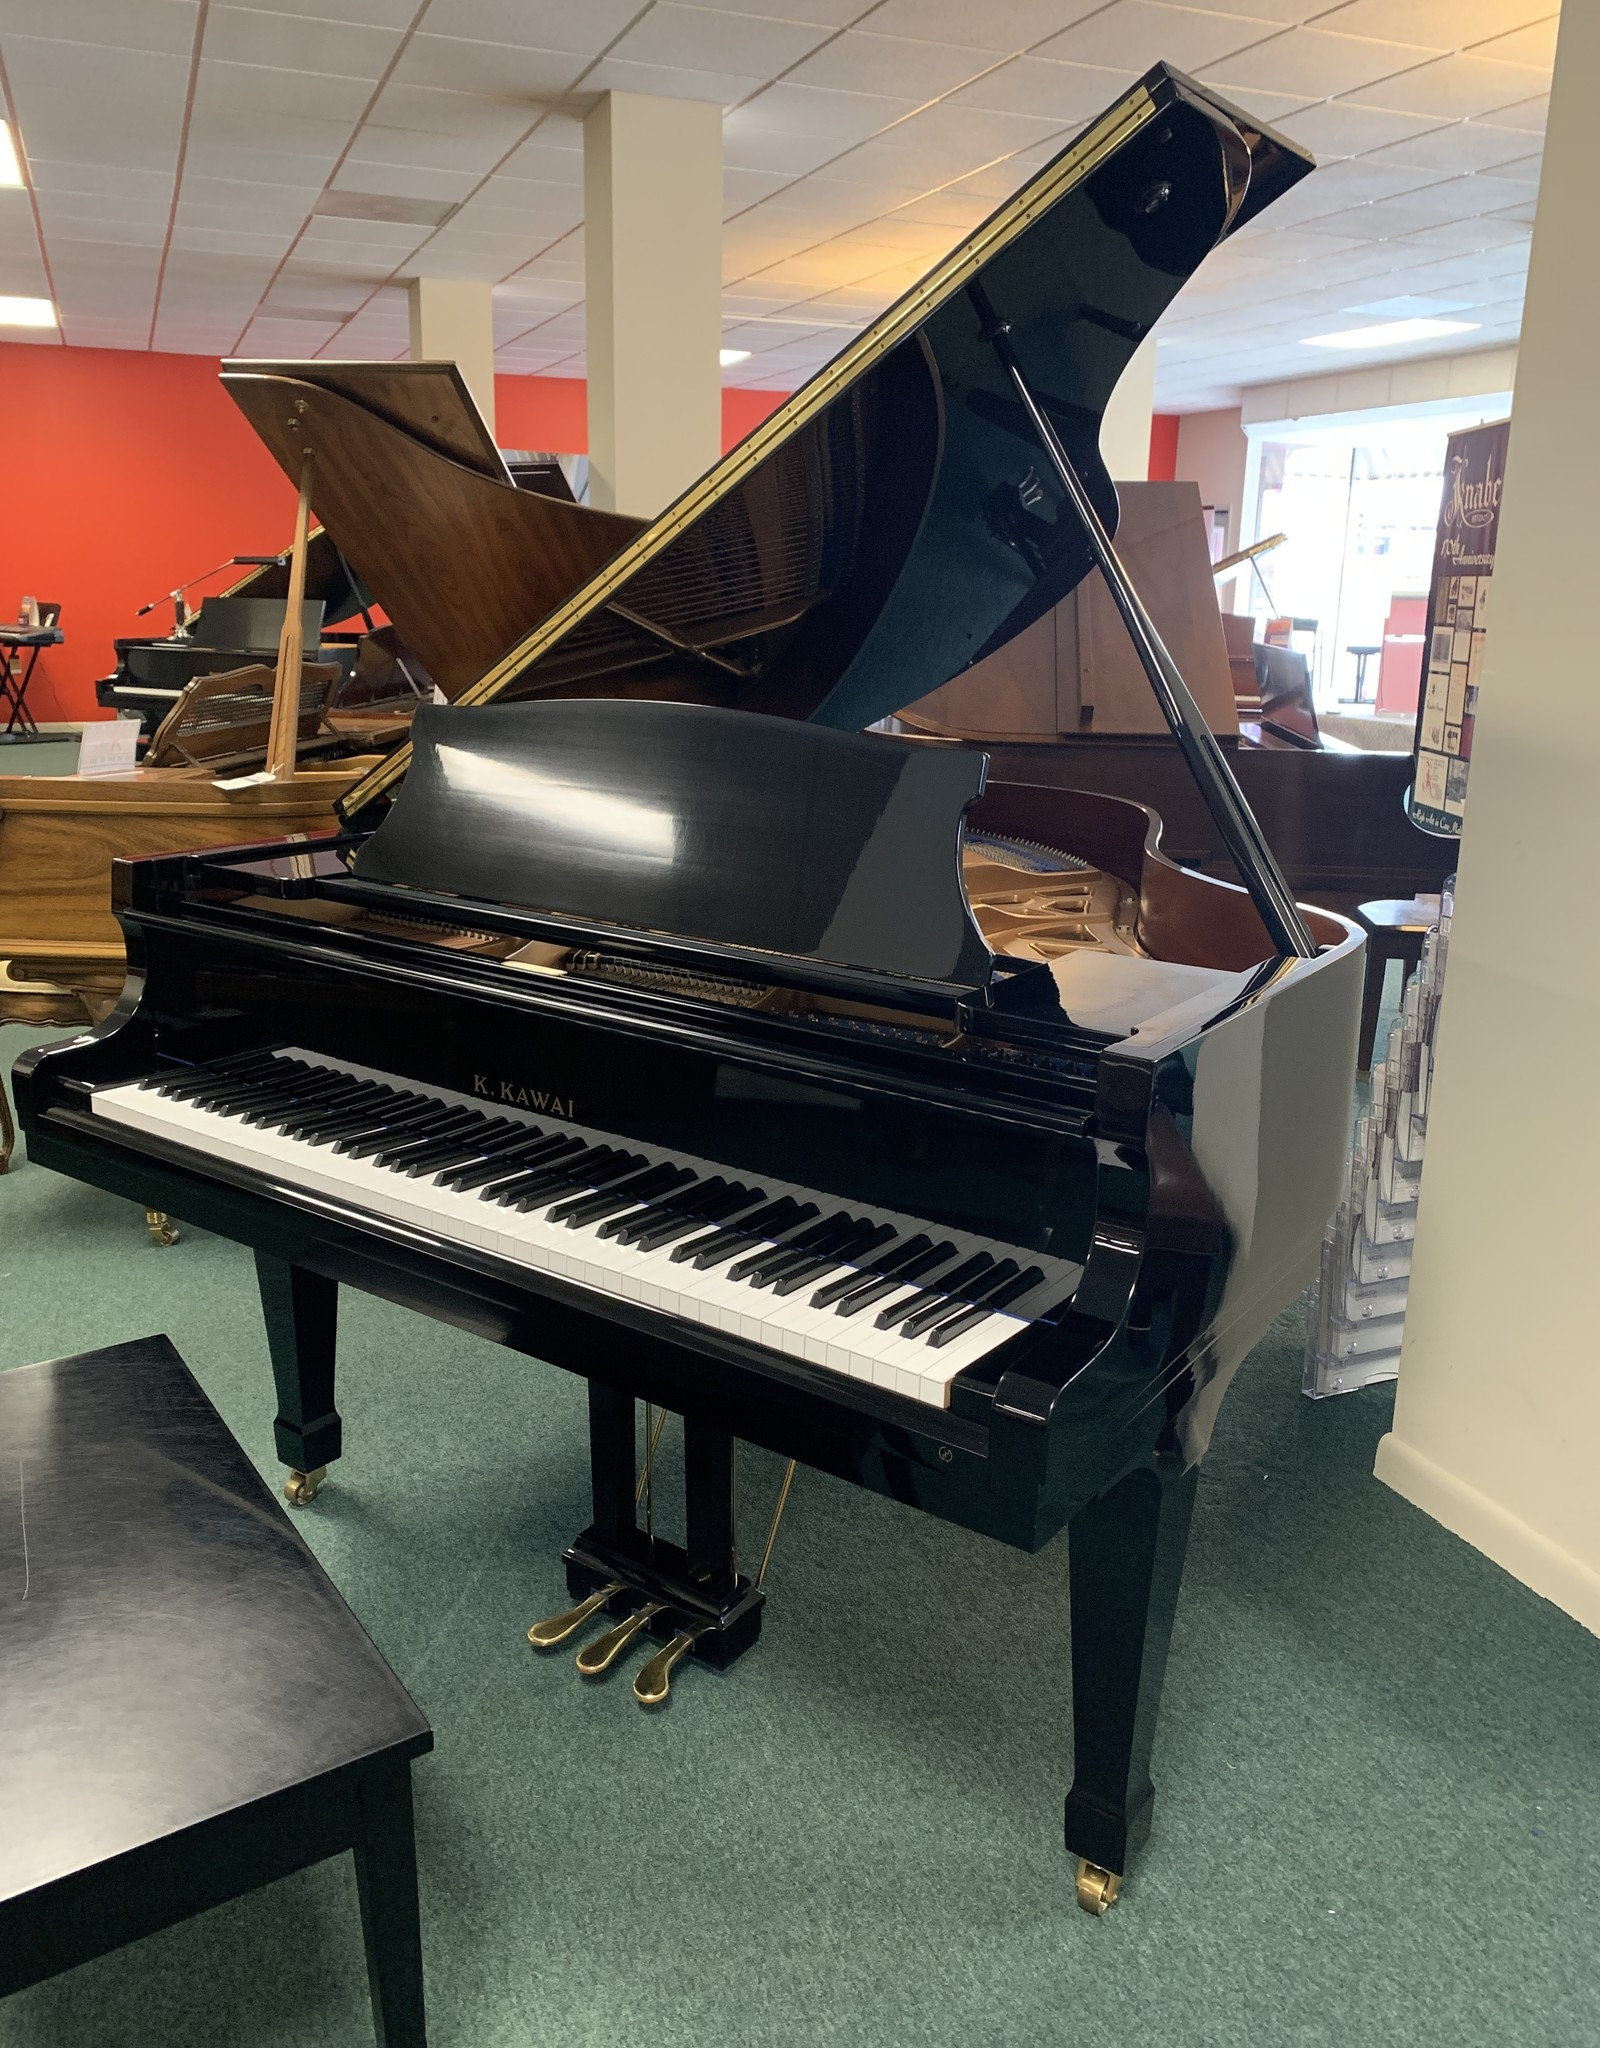 Kawai K. Kawai KG-2D 5'10 Grand Piano (High Polish Black)(Pre-Owned)